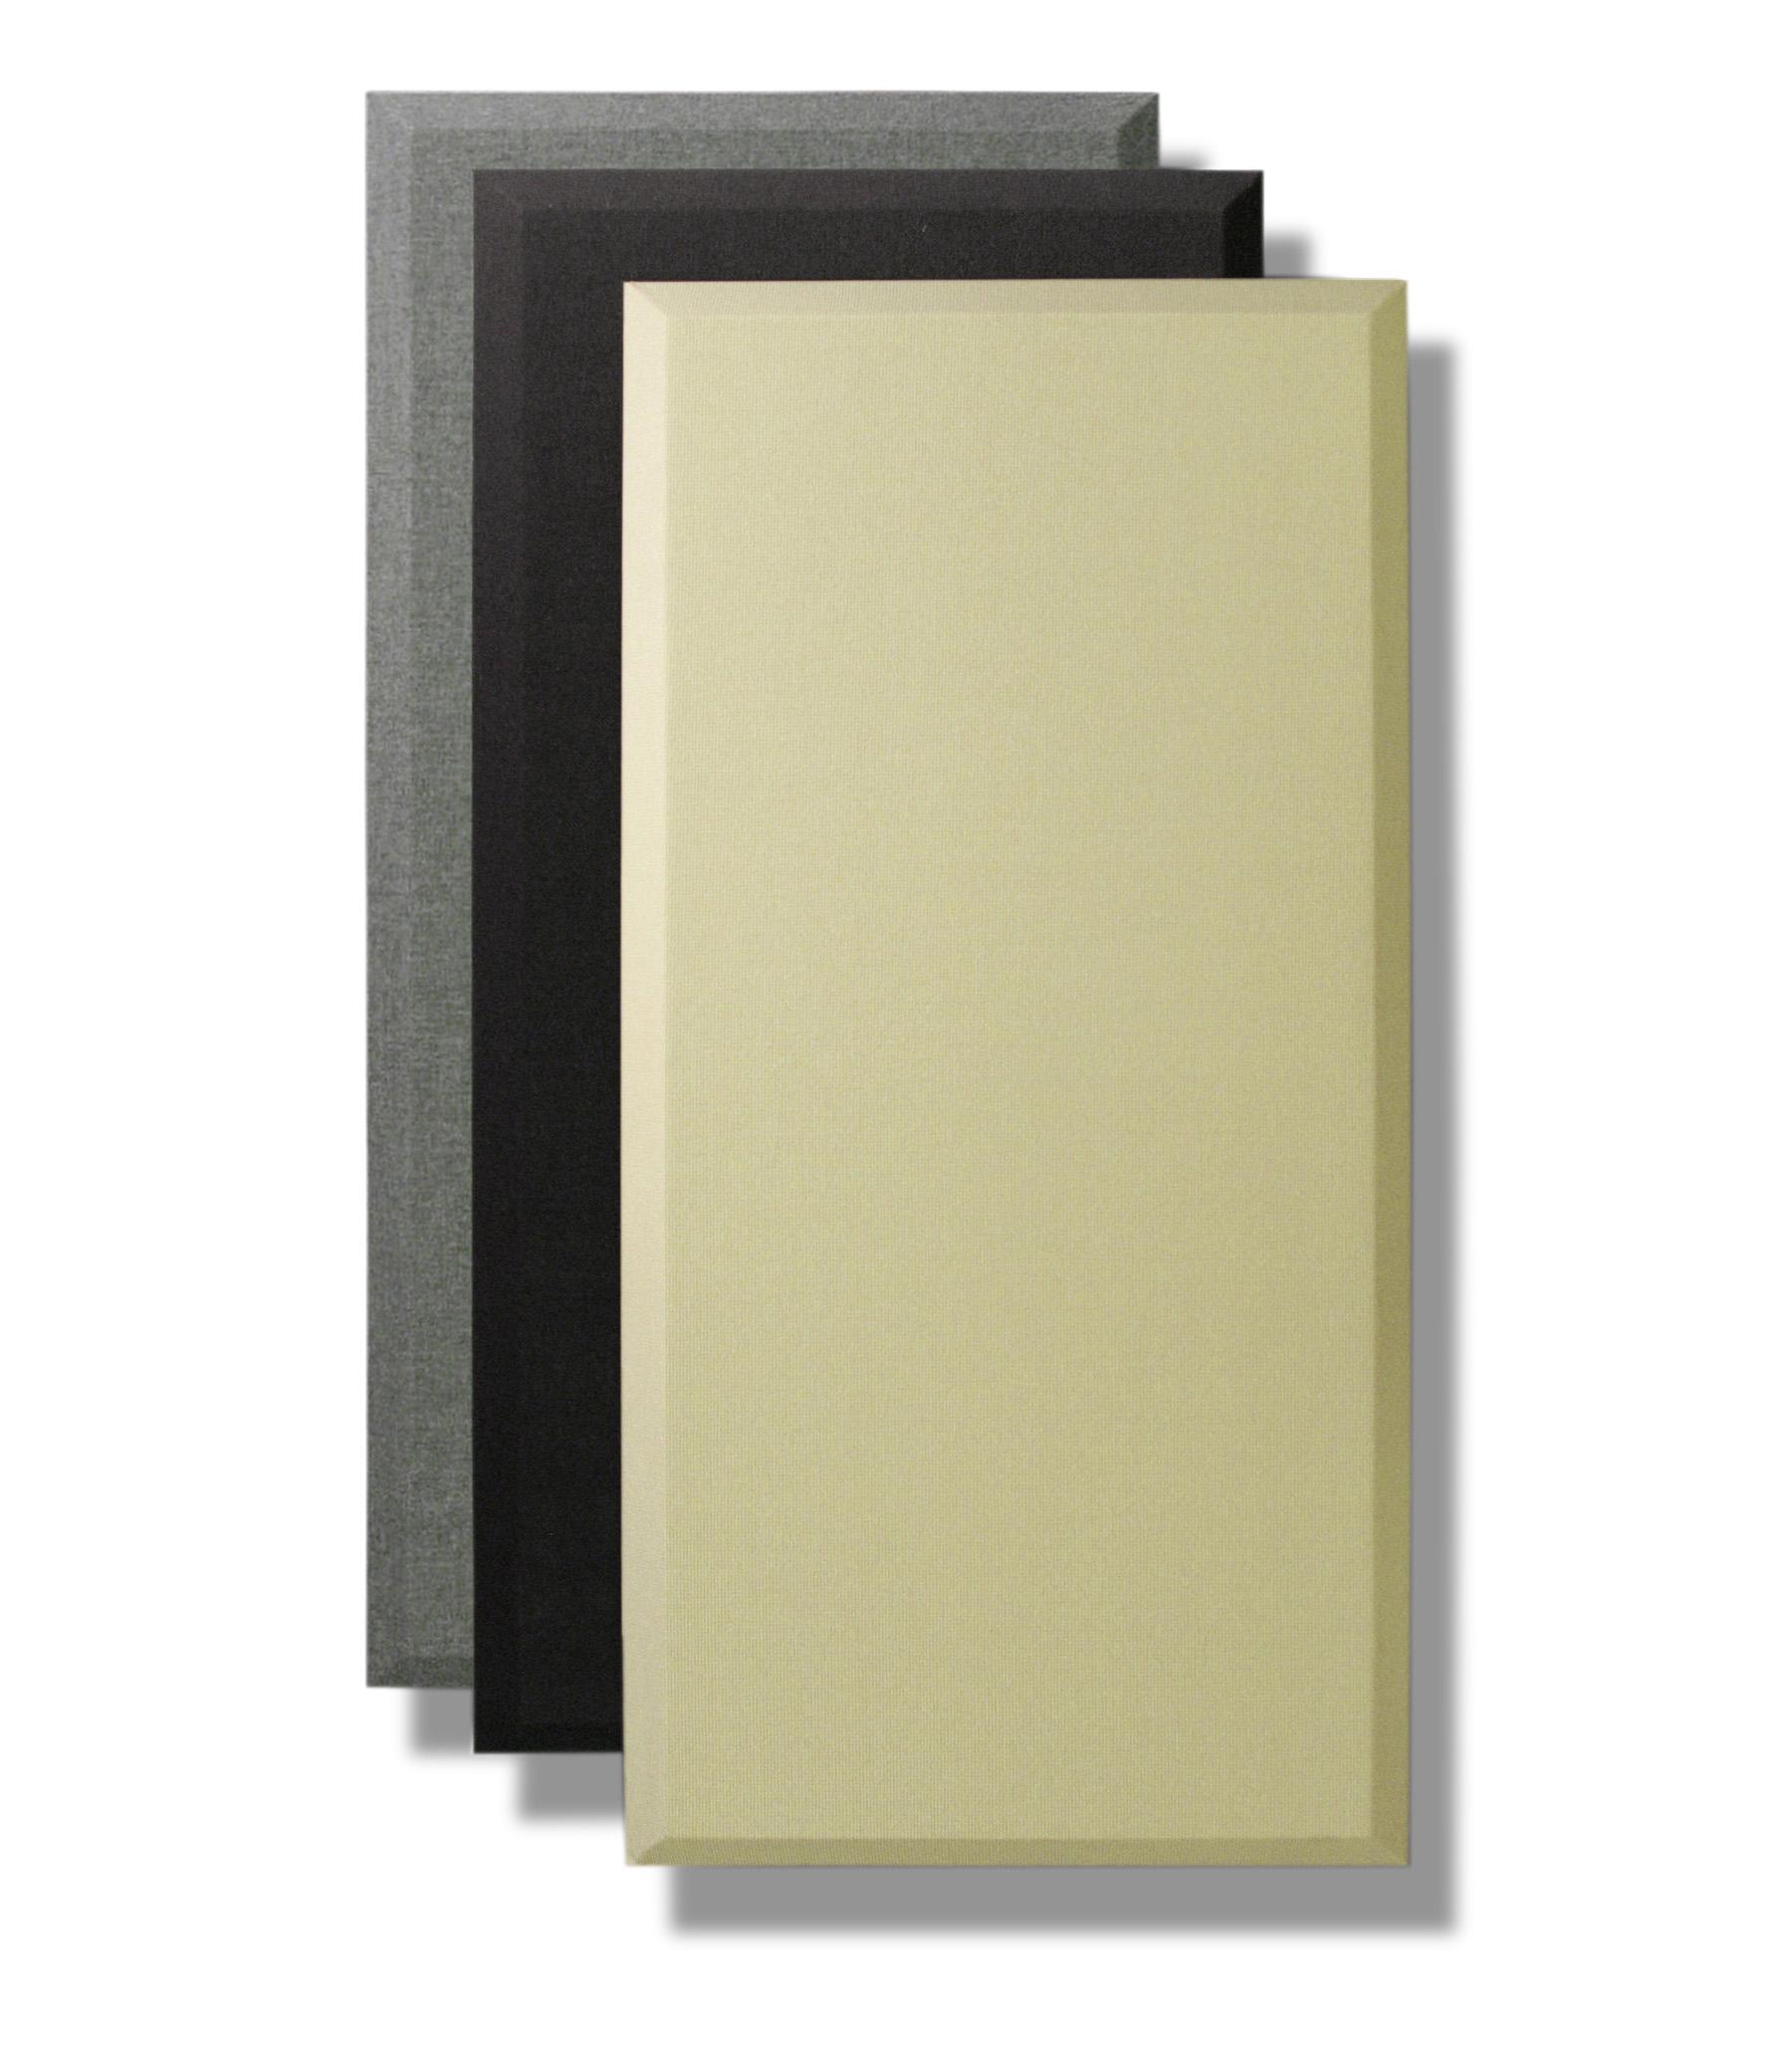 buy primacoustic 2 bevld 24x48 grey